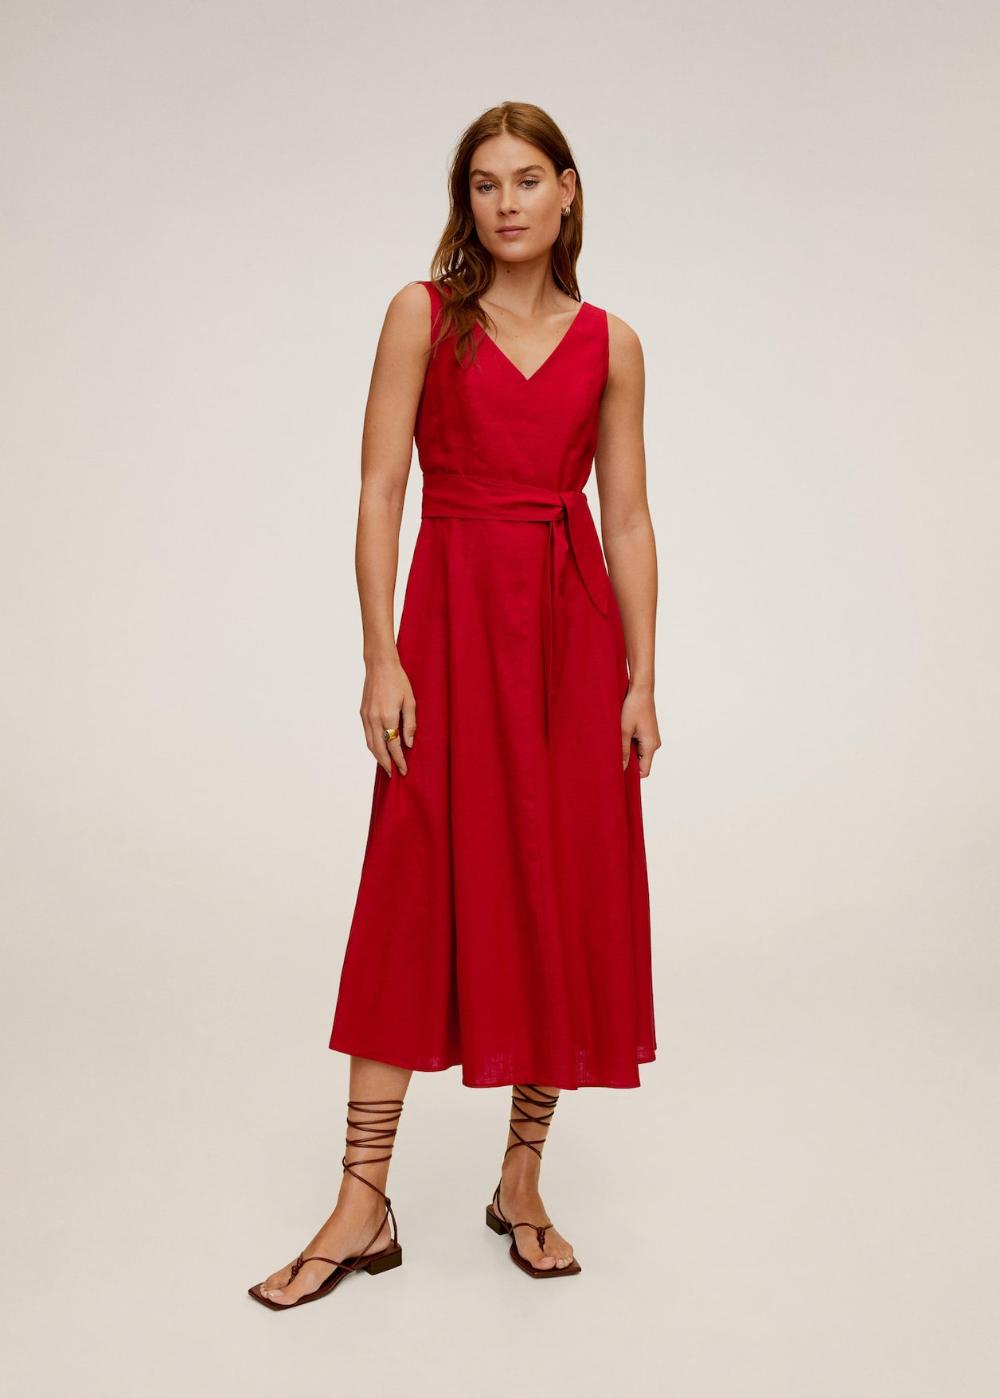 Linen-blend midi dress - Women  Mango USA  Midi dress, Womens